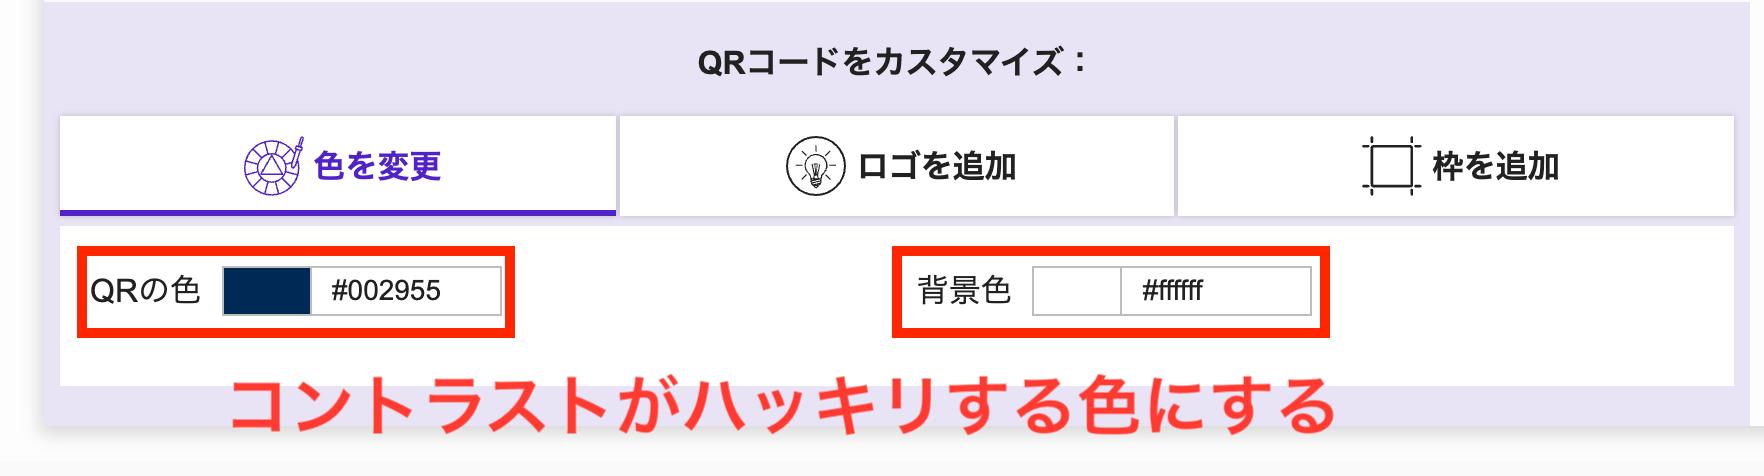 QR作成手順2